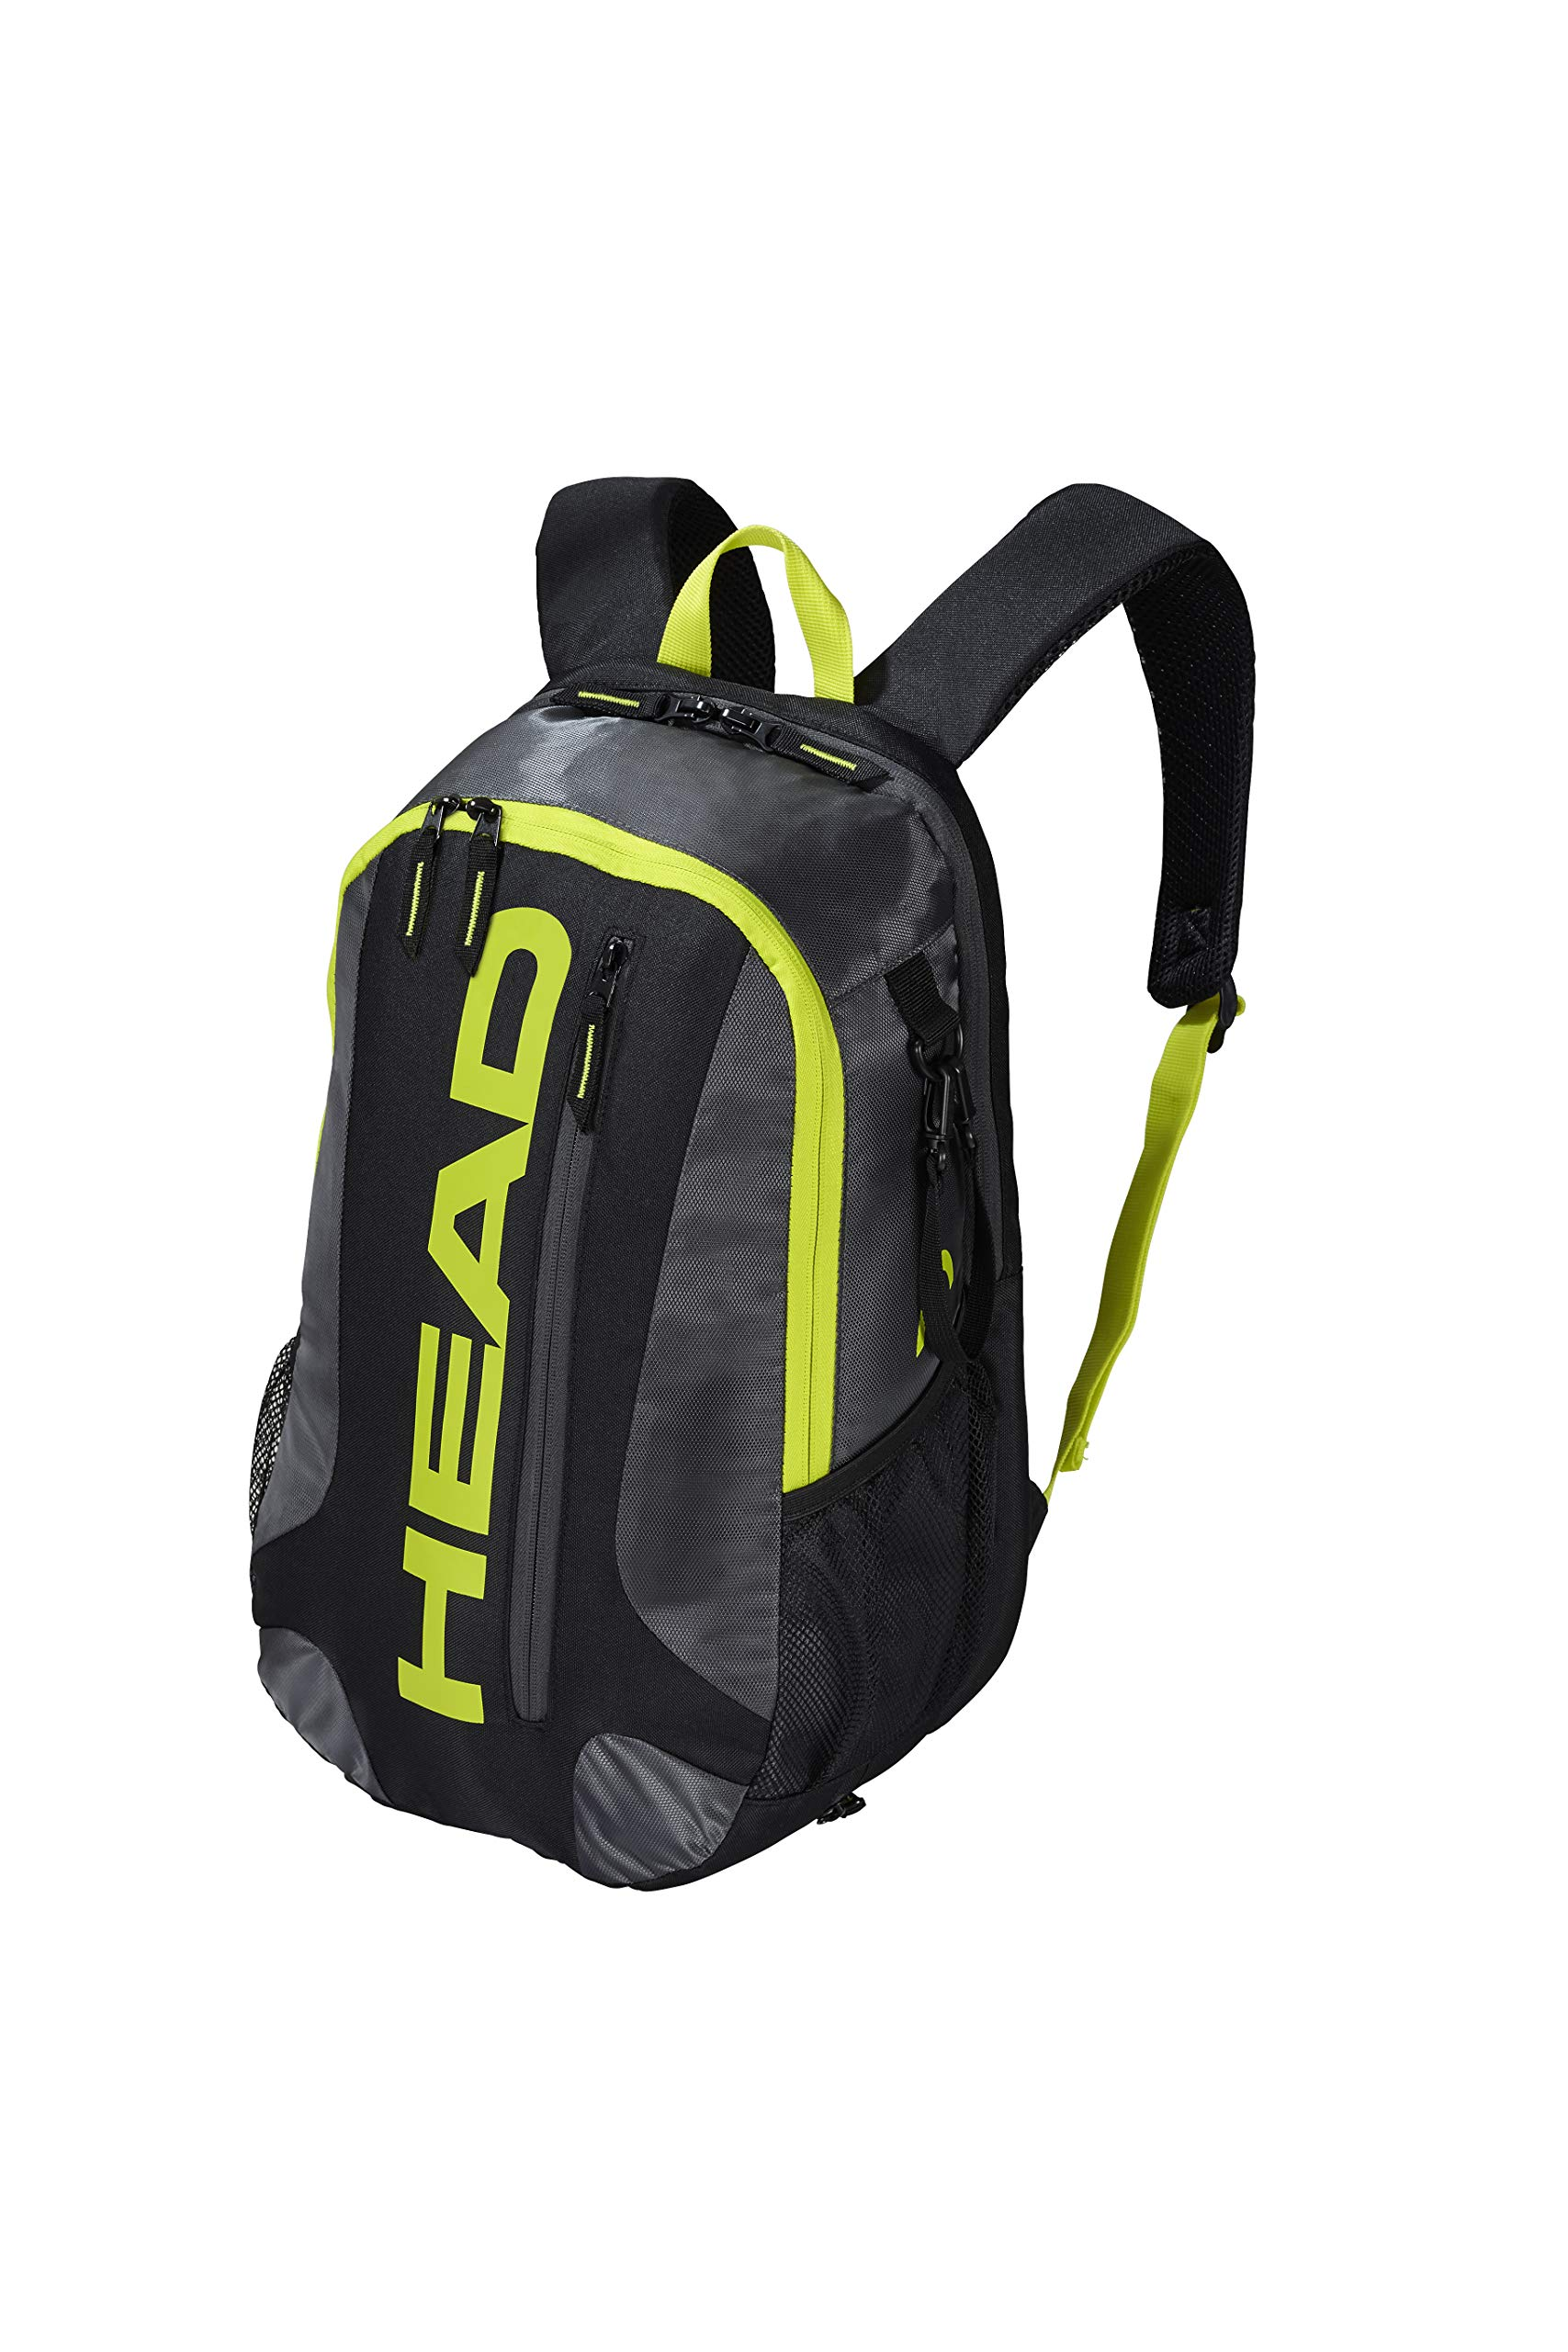 HEAD Racquetball/Pickleball Club Backpack Bag